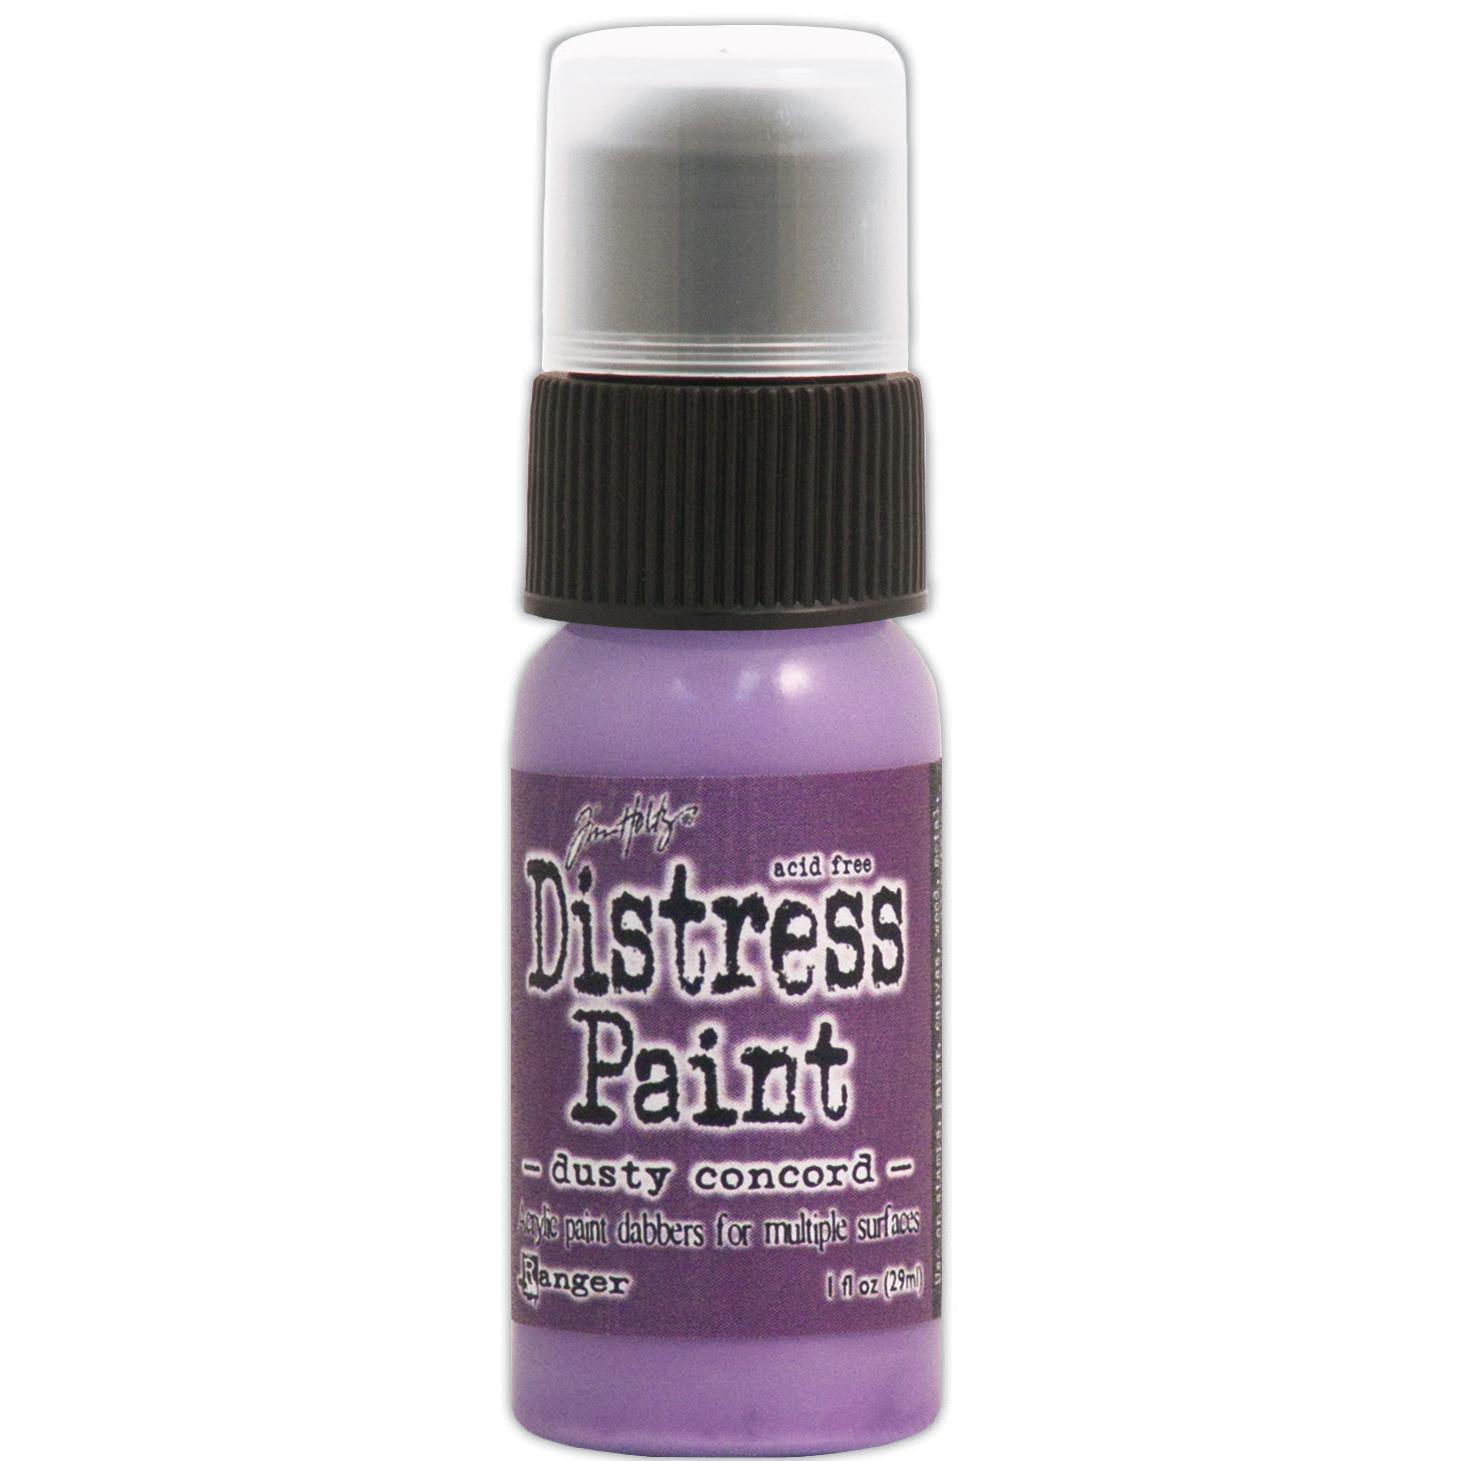 Tim Holtz Distress Paint Dabber 1oz-Dusty Concord